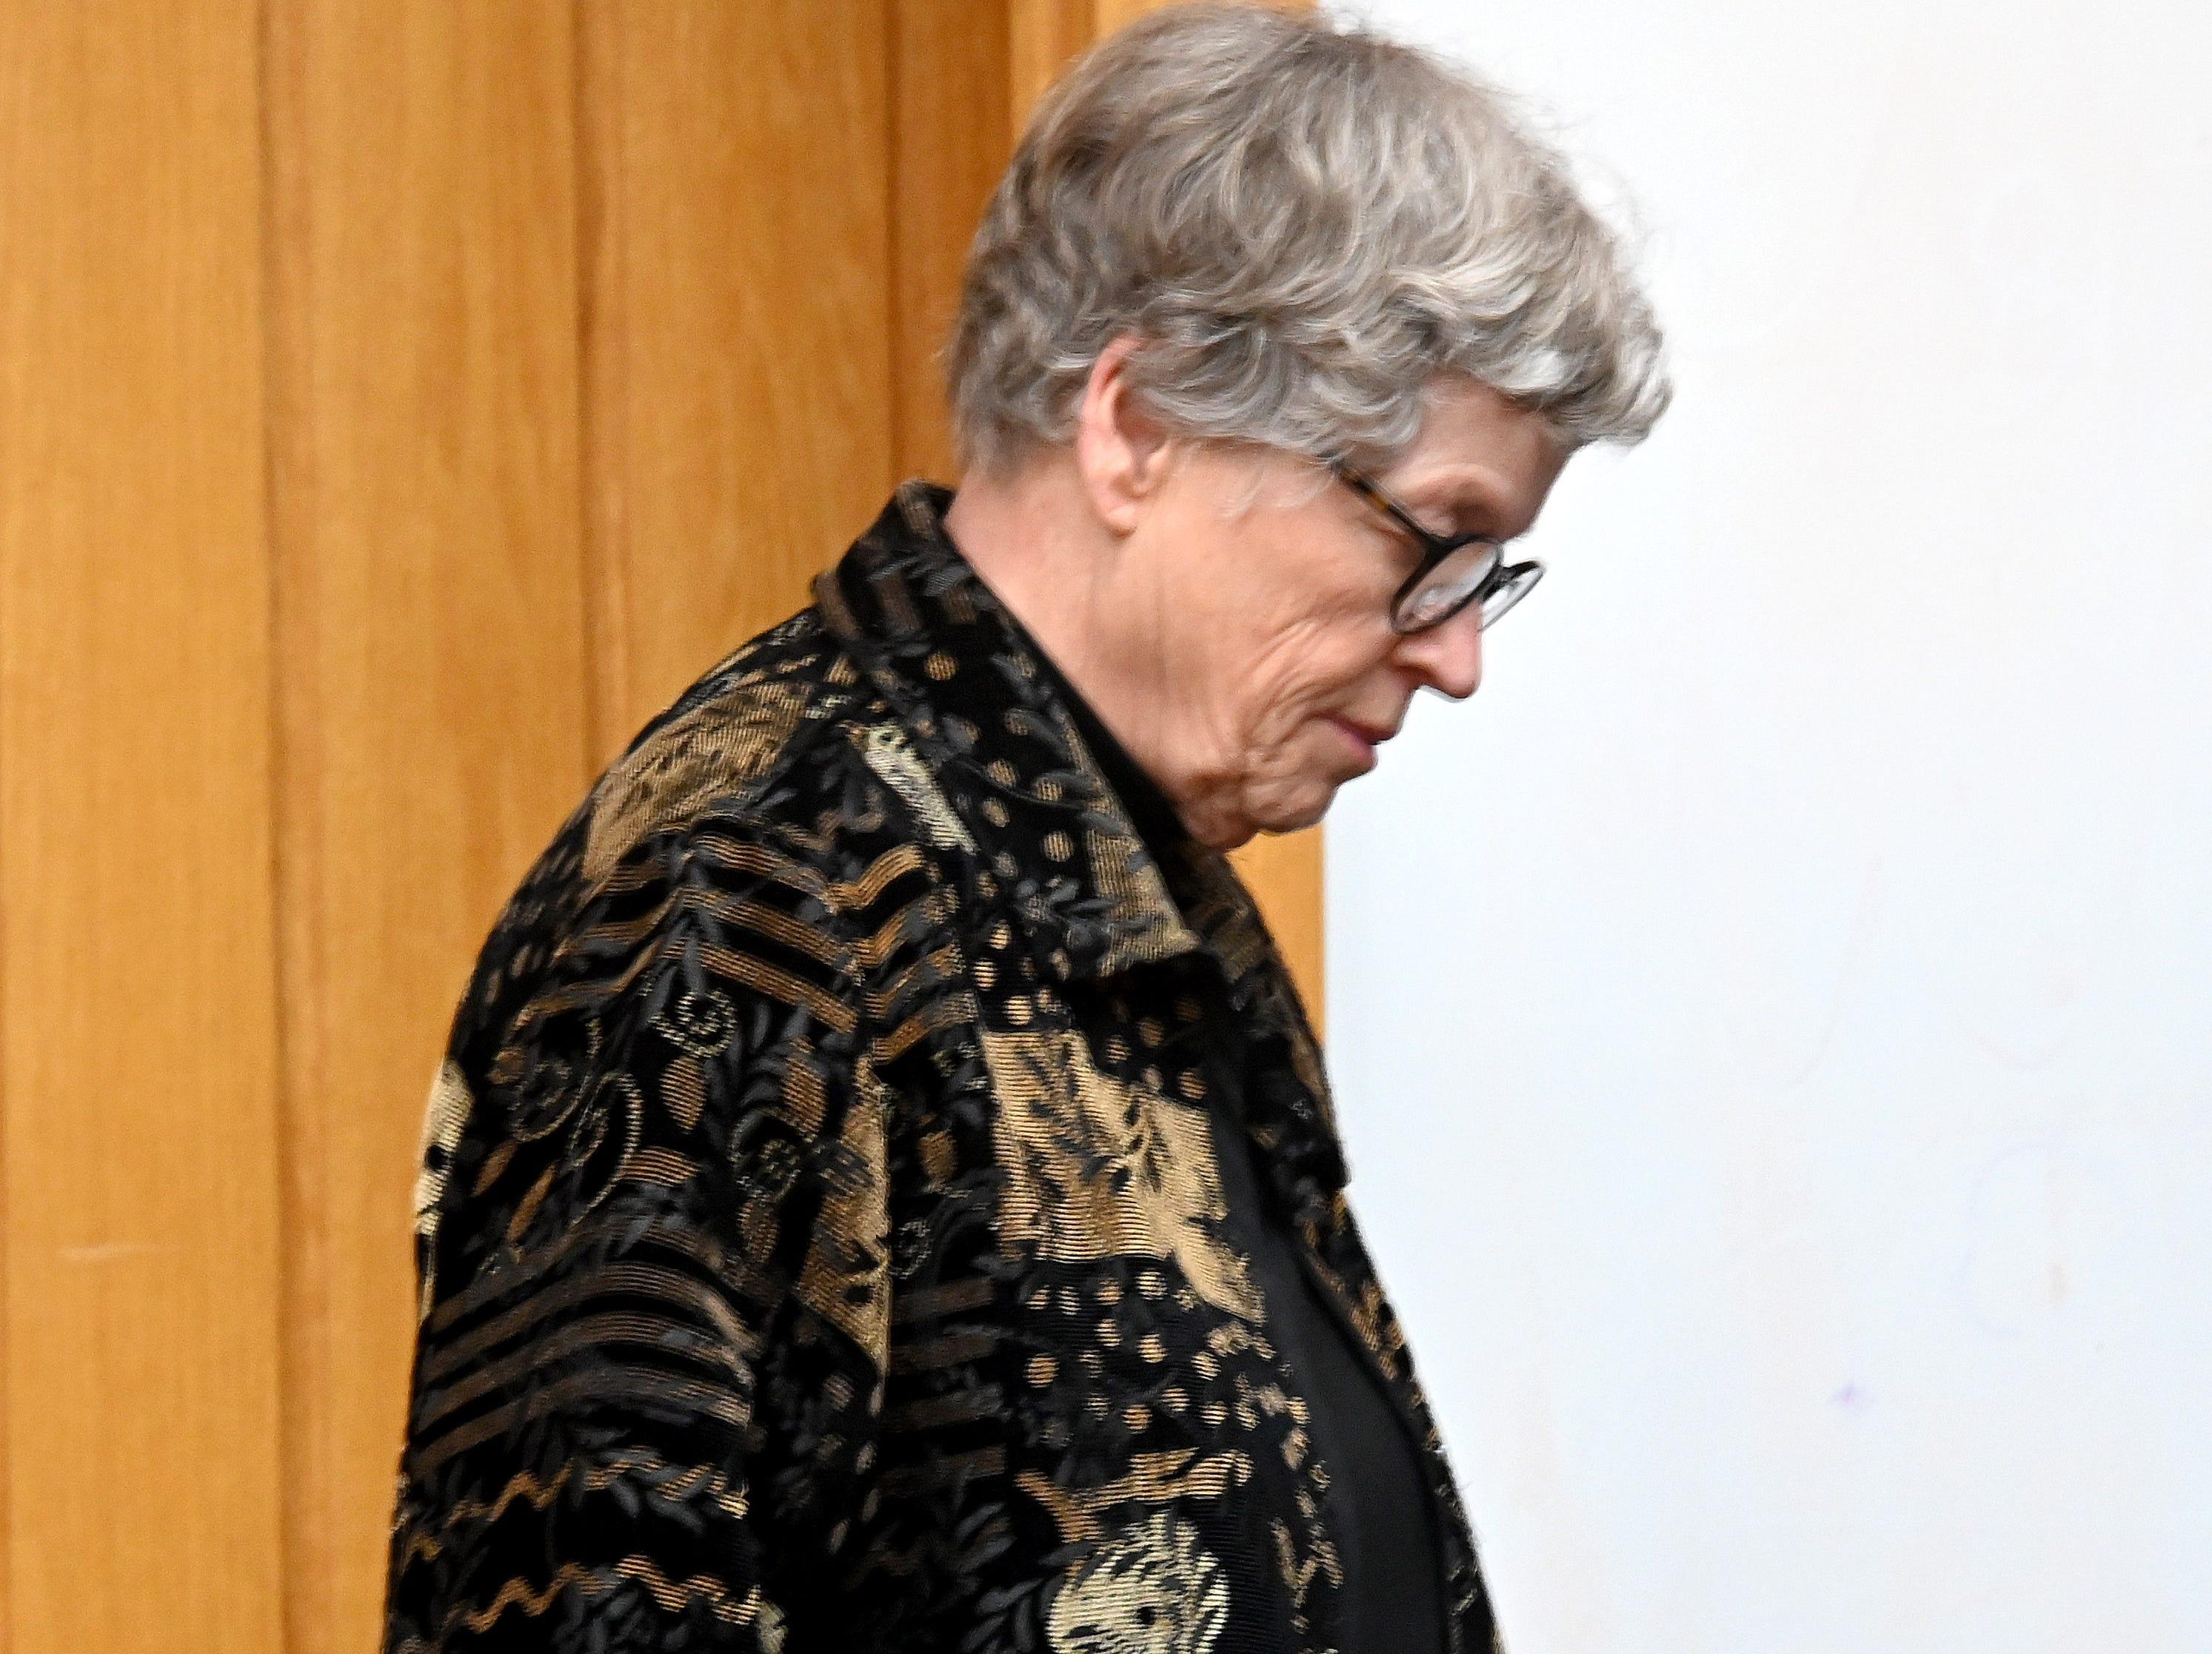 Lou Anna K. Simon arrives for her pretrial hearing.